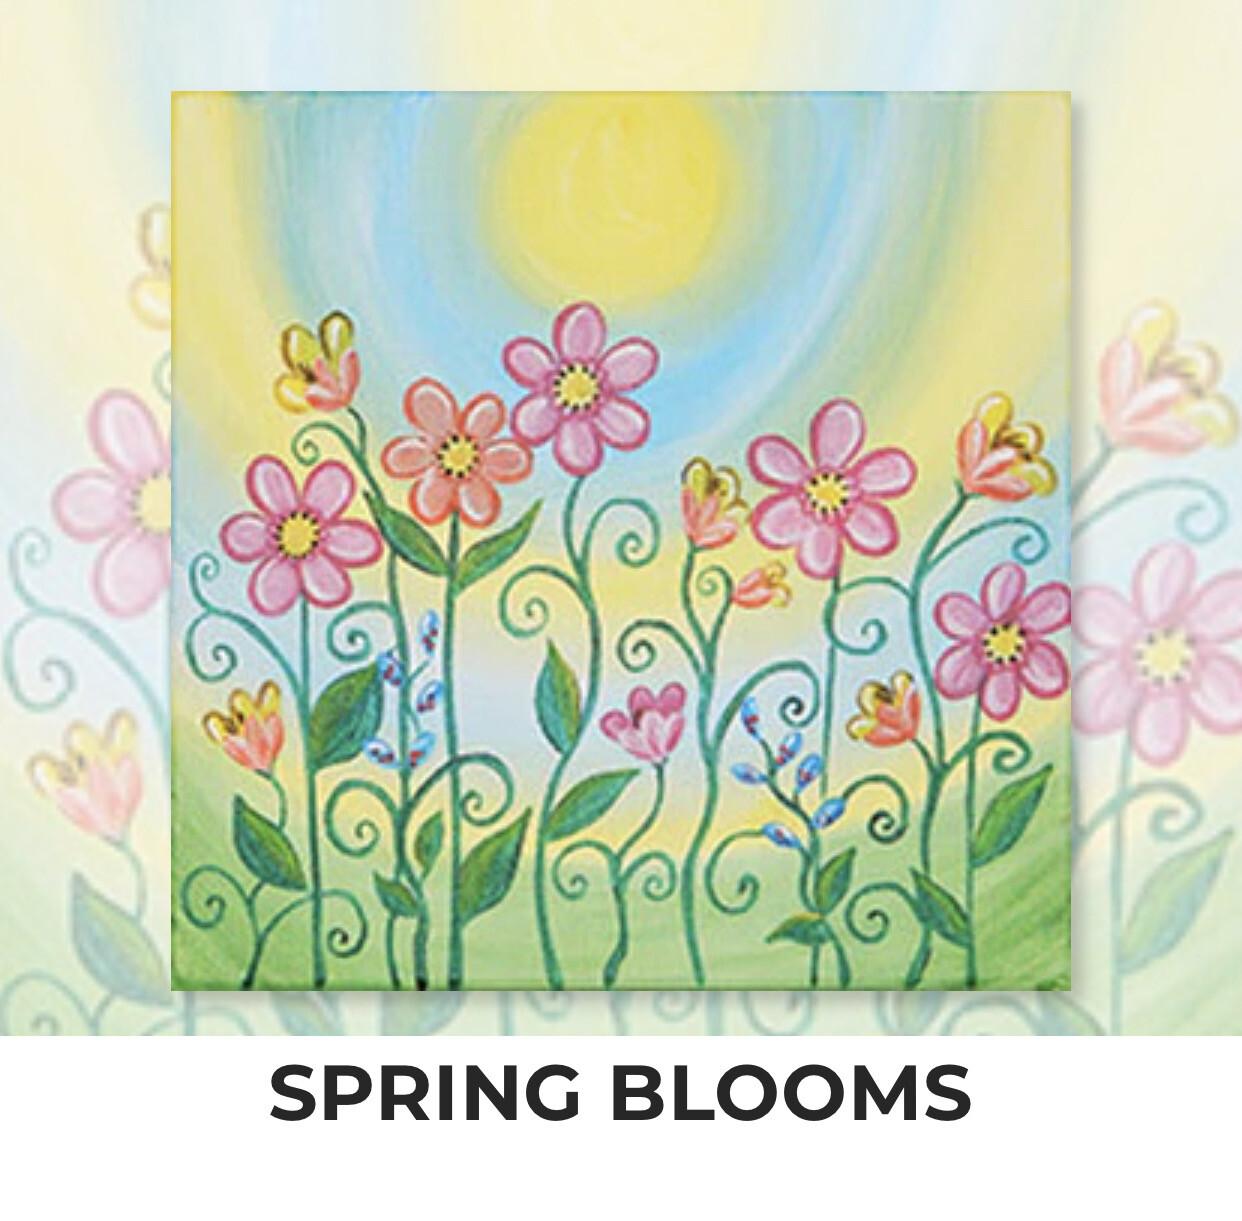 Spring Blooms KIDS Acrylic Paint On Canvas DIY Art Kit